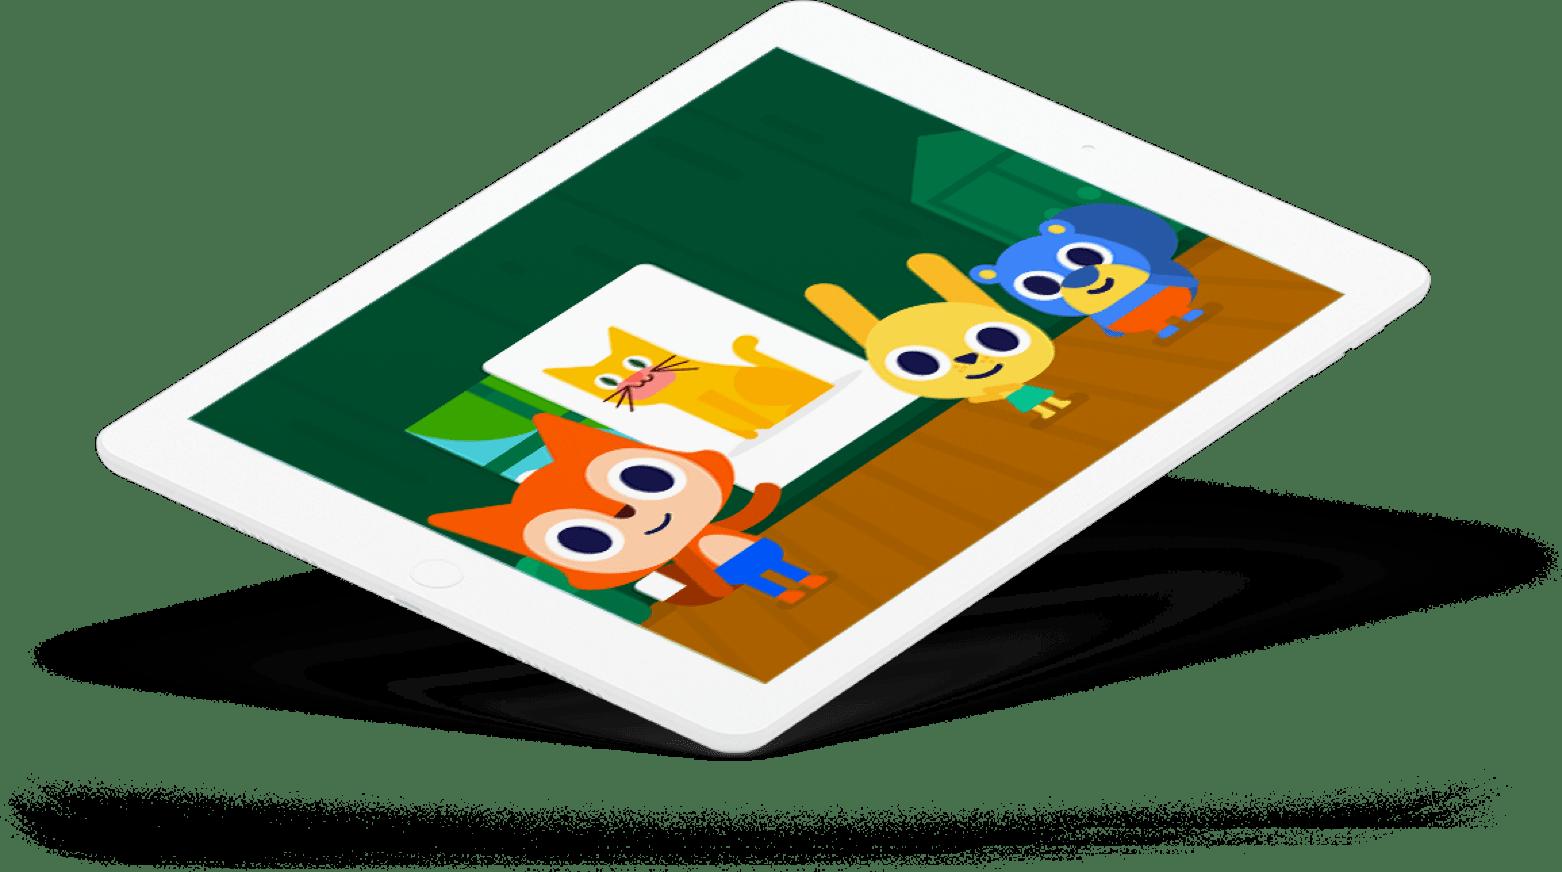 ipad with screenshot of app